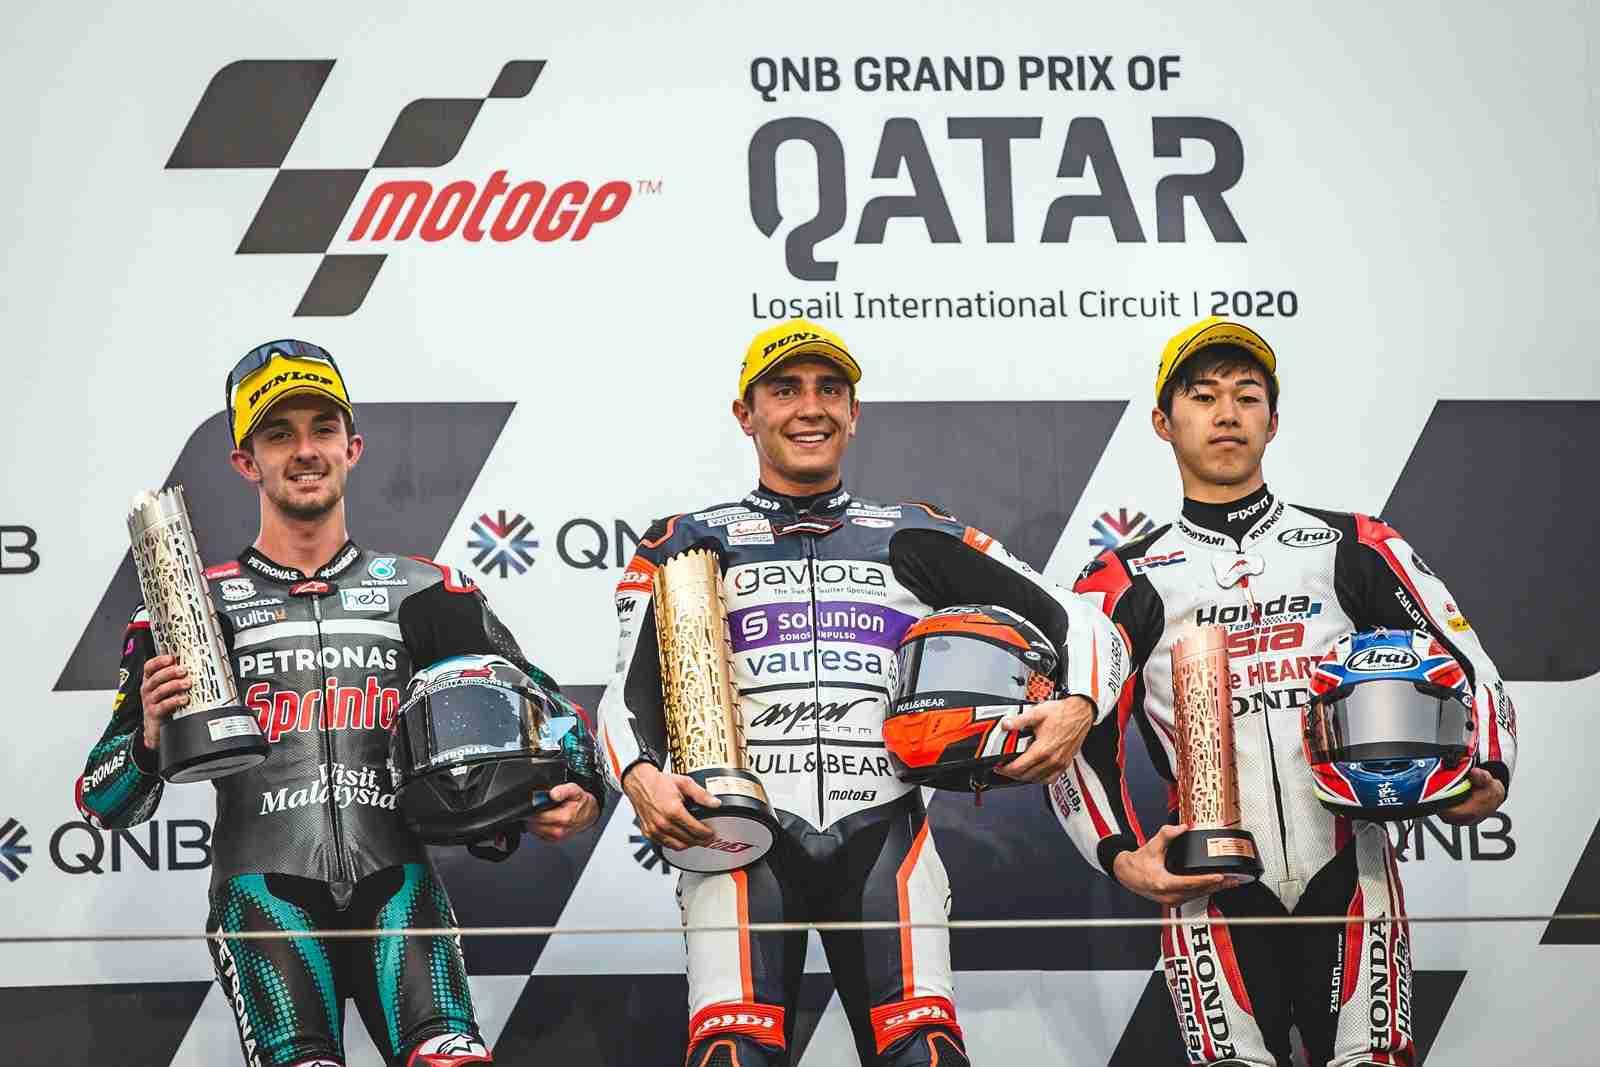 Moto3 Qatar winners 2020 - Albert Arenas - John McPhee - Ai Ogura